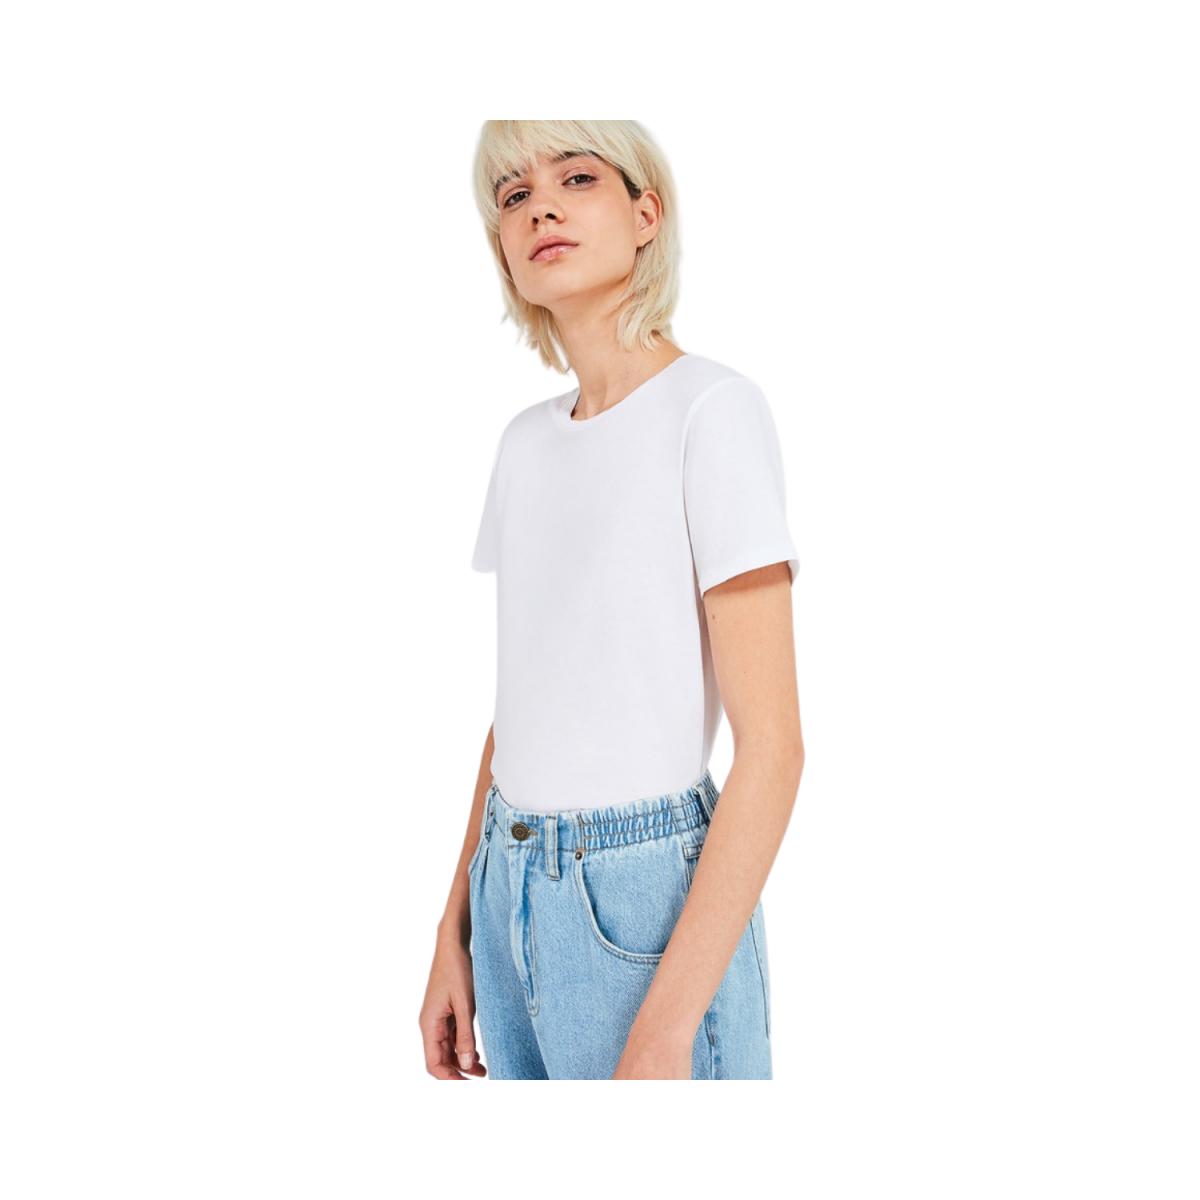 vegiflower t-shirt - blance - model billede front